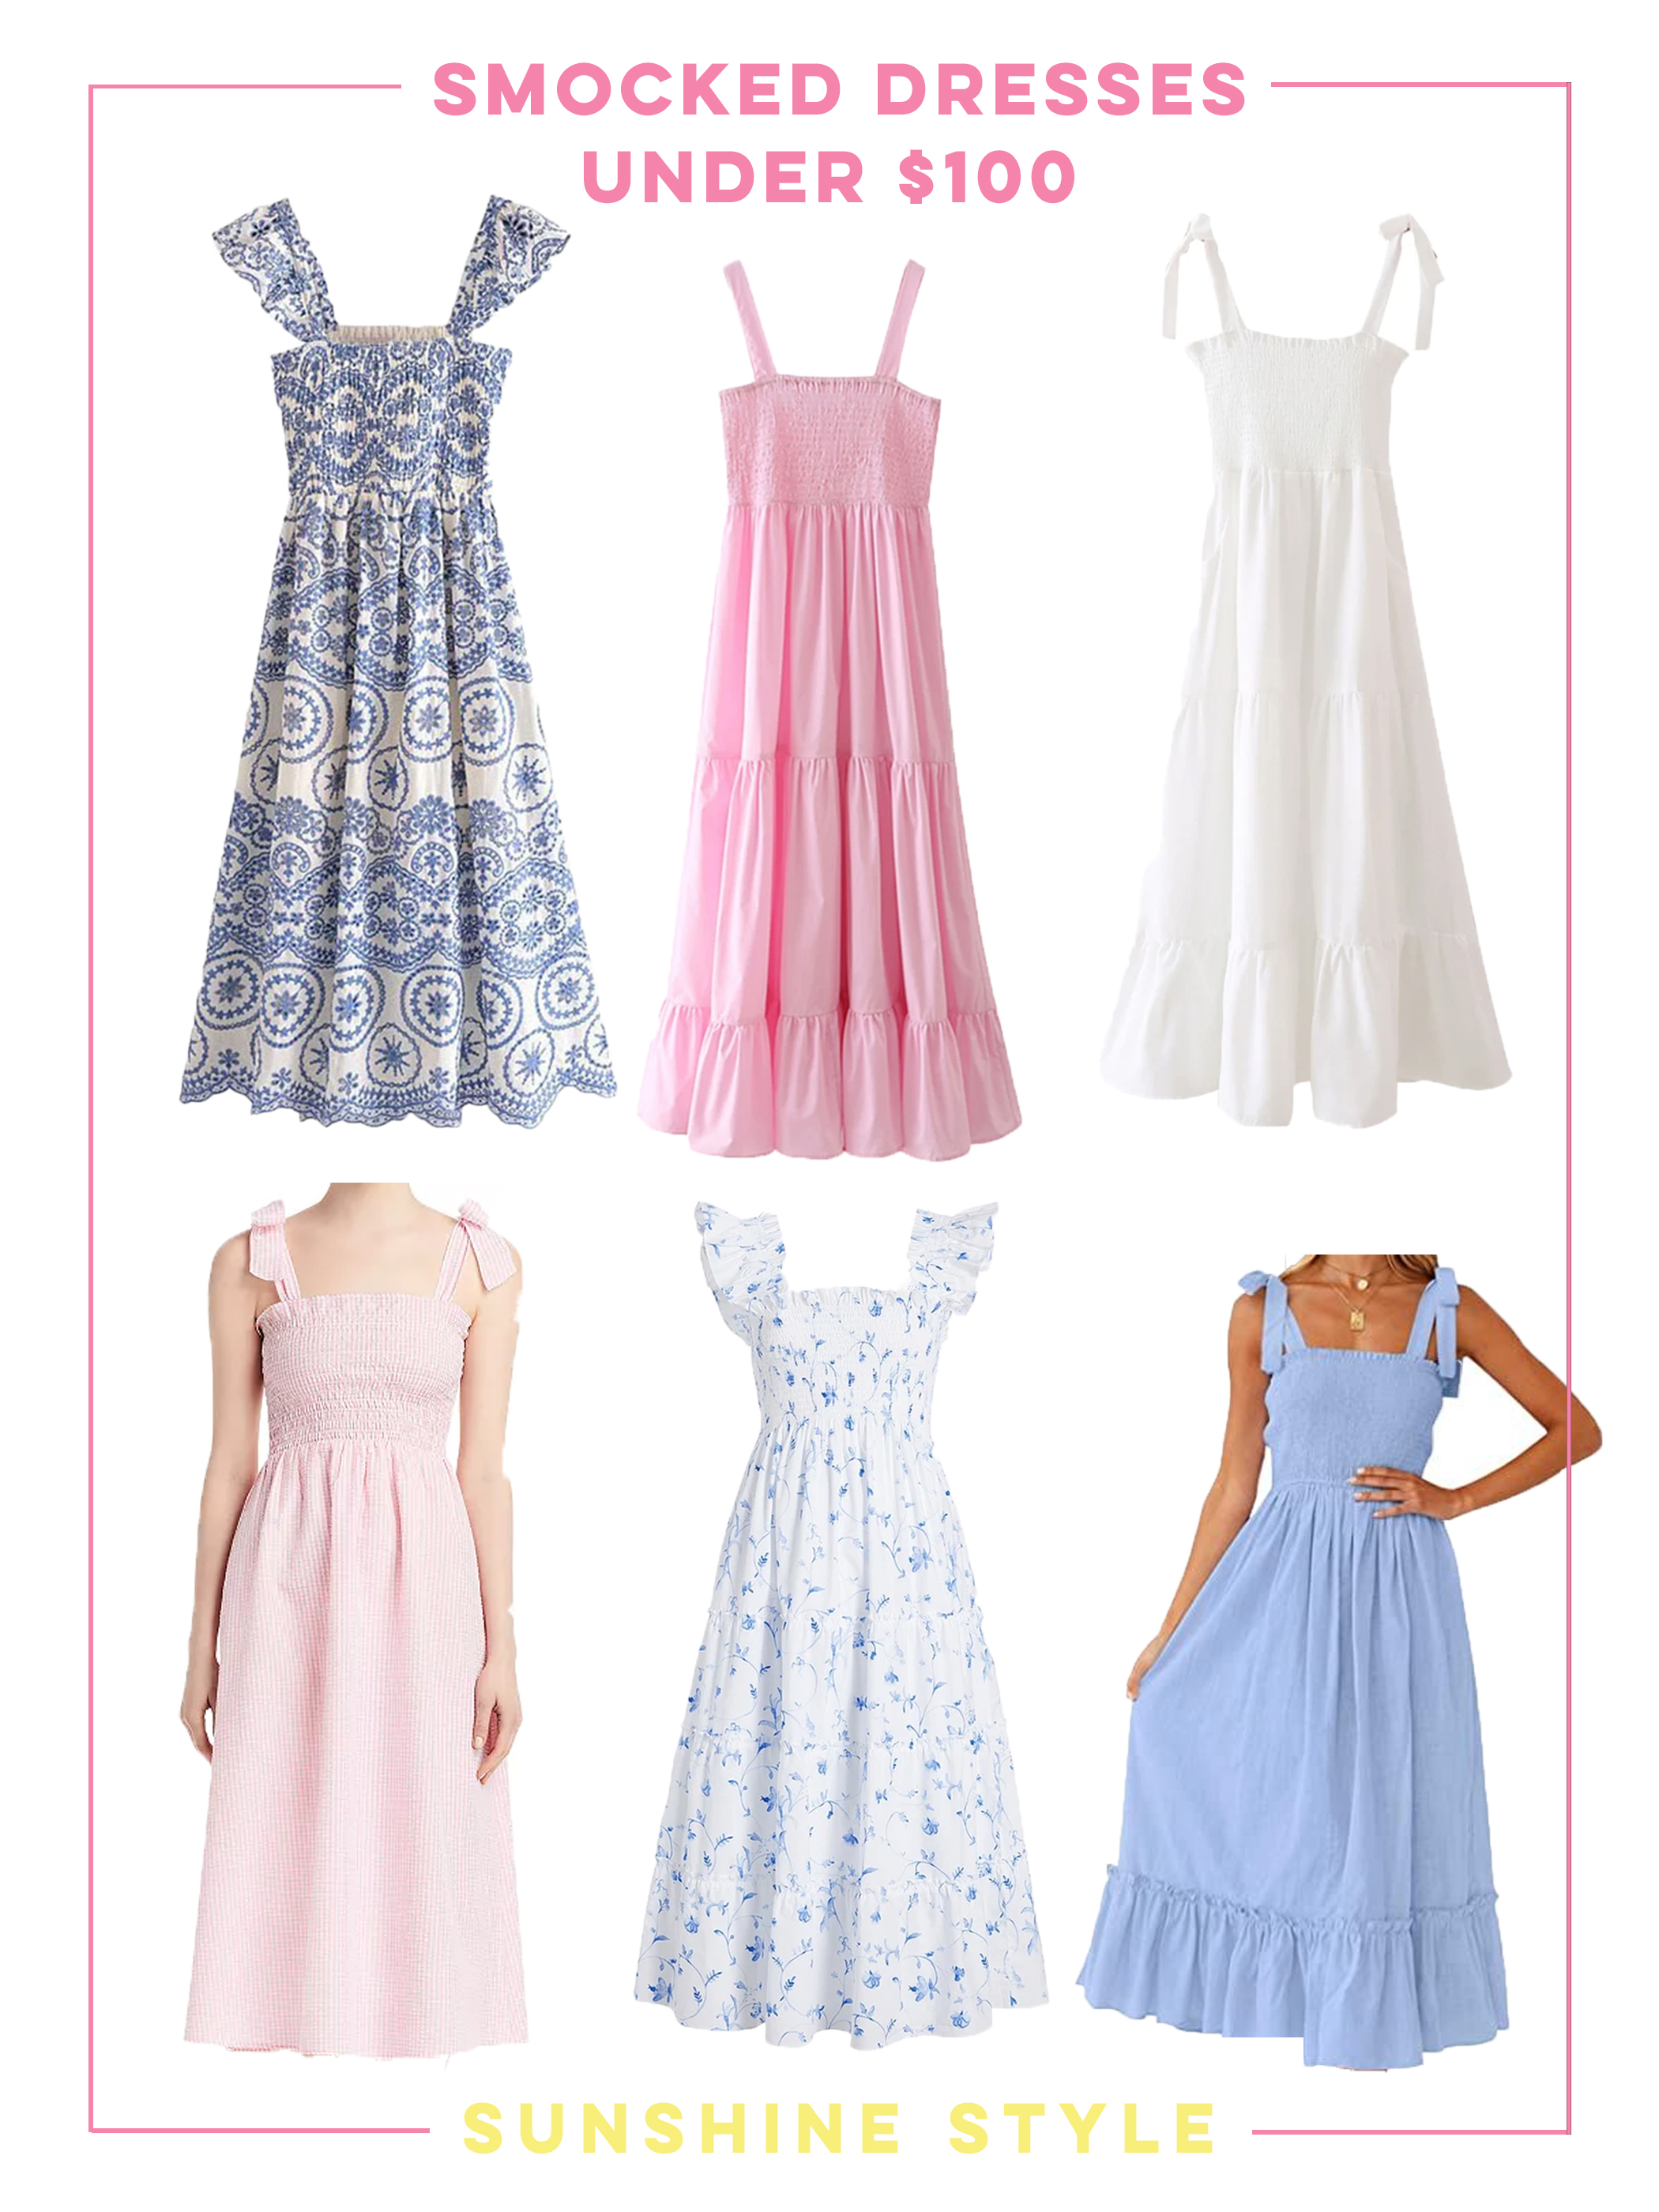 collage of Smocked Dresses under $100